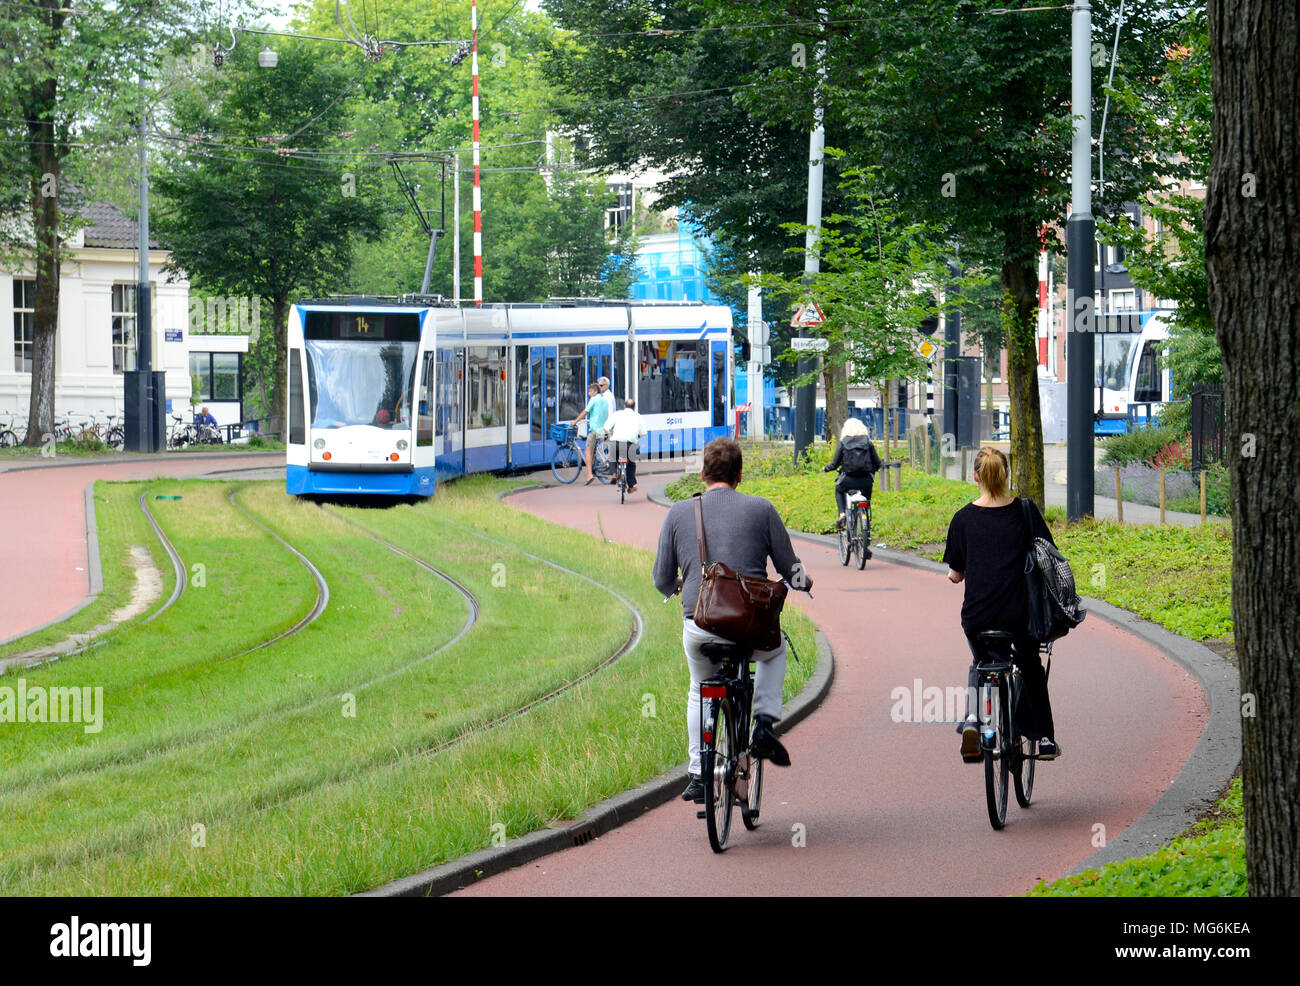 Tram in Amsterdam - Stock Image